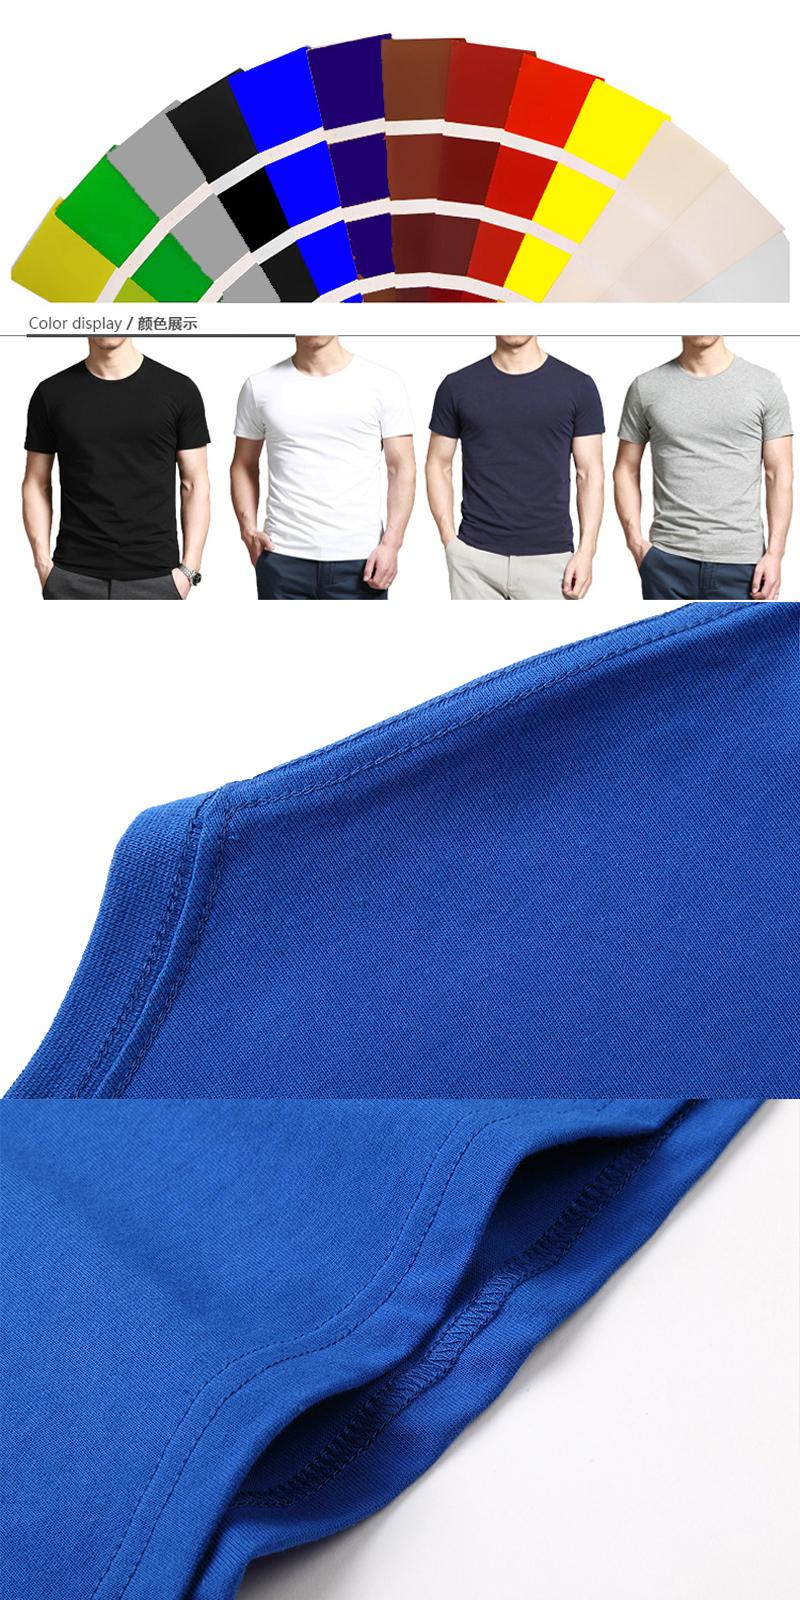 t-shirt-valar-morghulis-2-man9-asylum4nerd